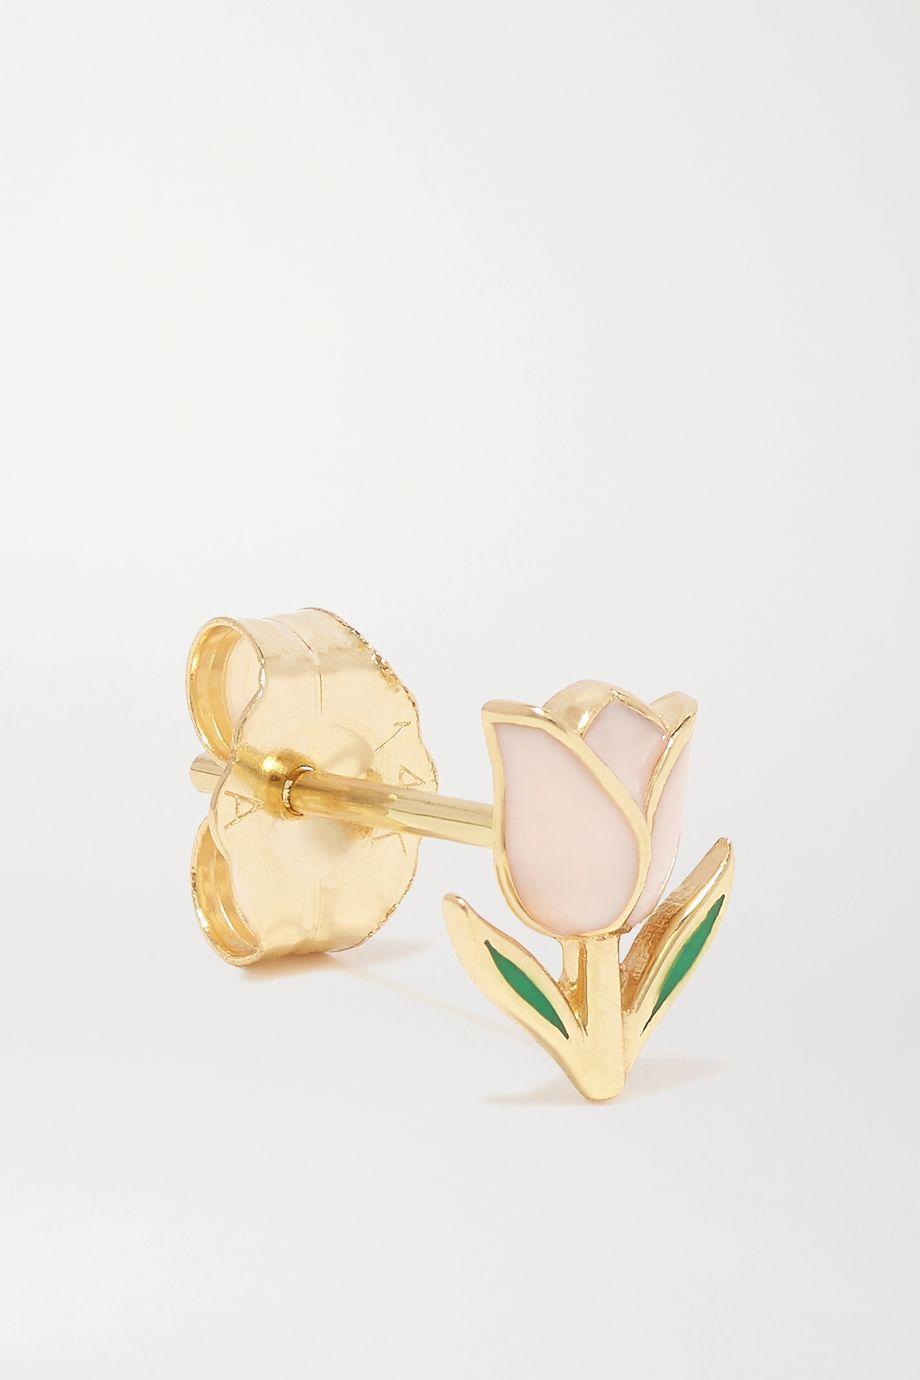 Alison Lou Tulip Ohrring aus 14 Karat Gold mit Emaille